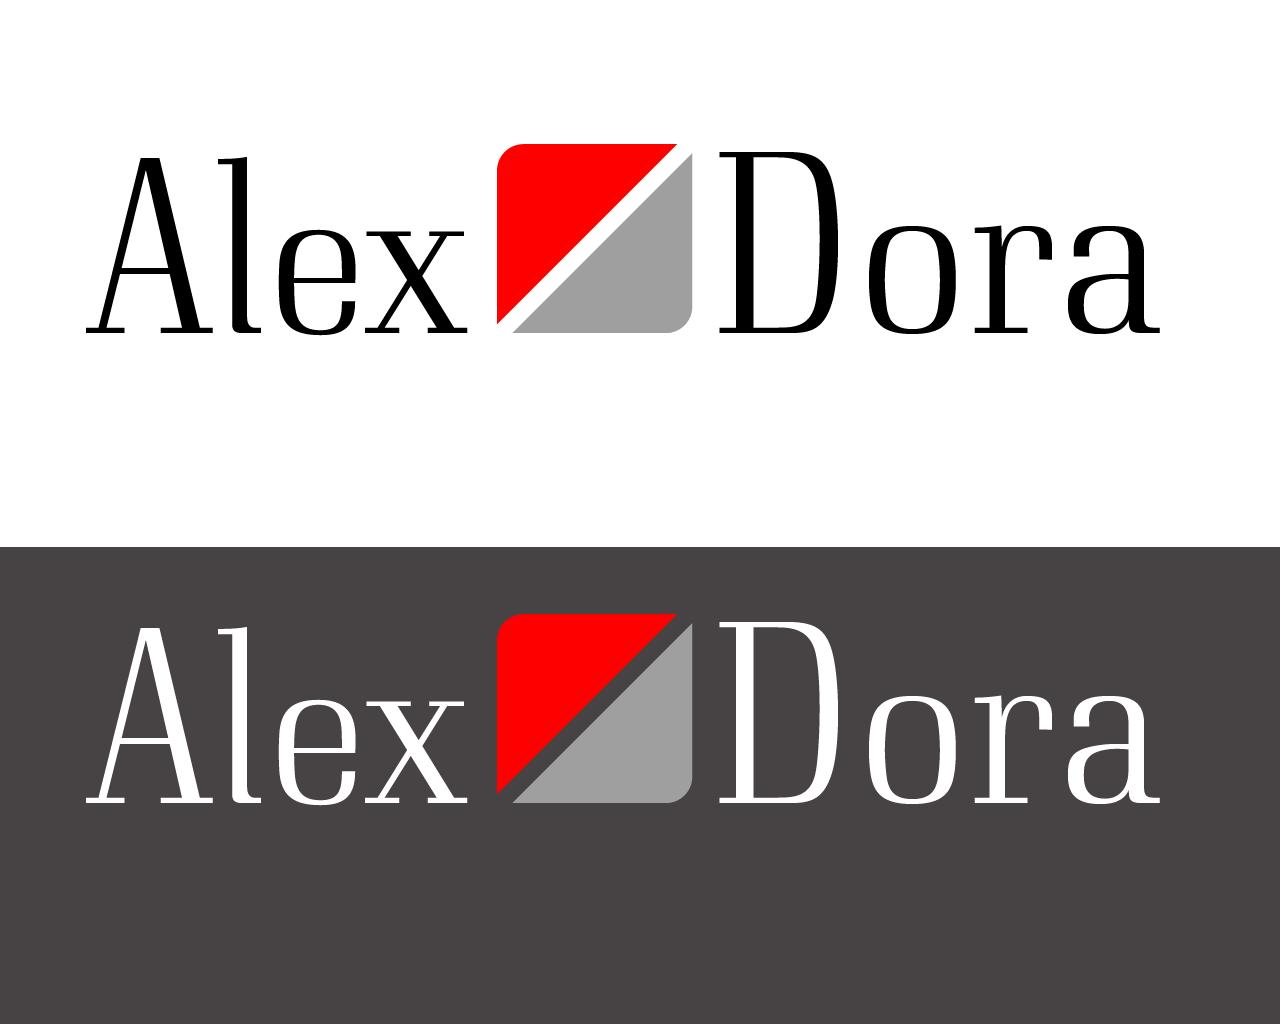 Необходим дизайнер для доработки логотипа бренда одежды фото f_5595b38fa38bfbf1.png